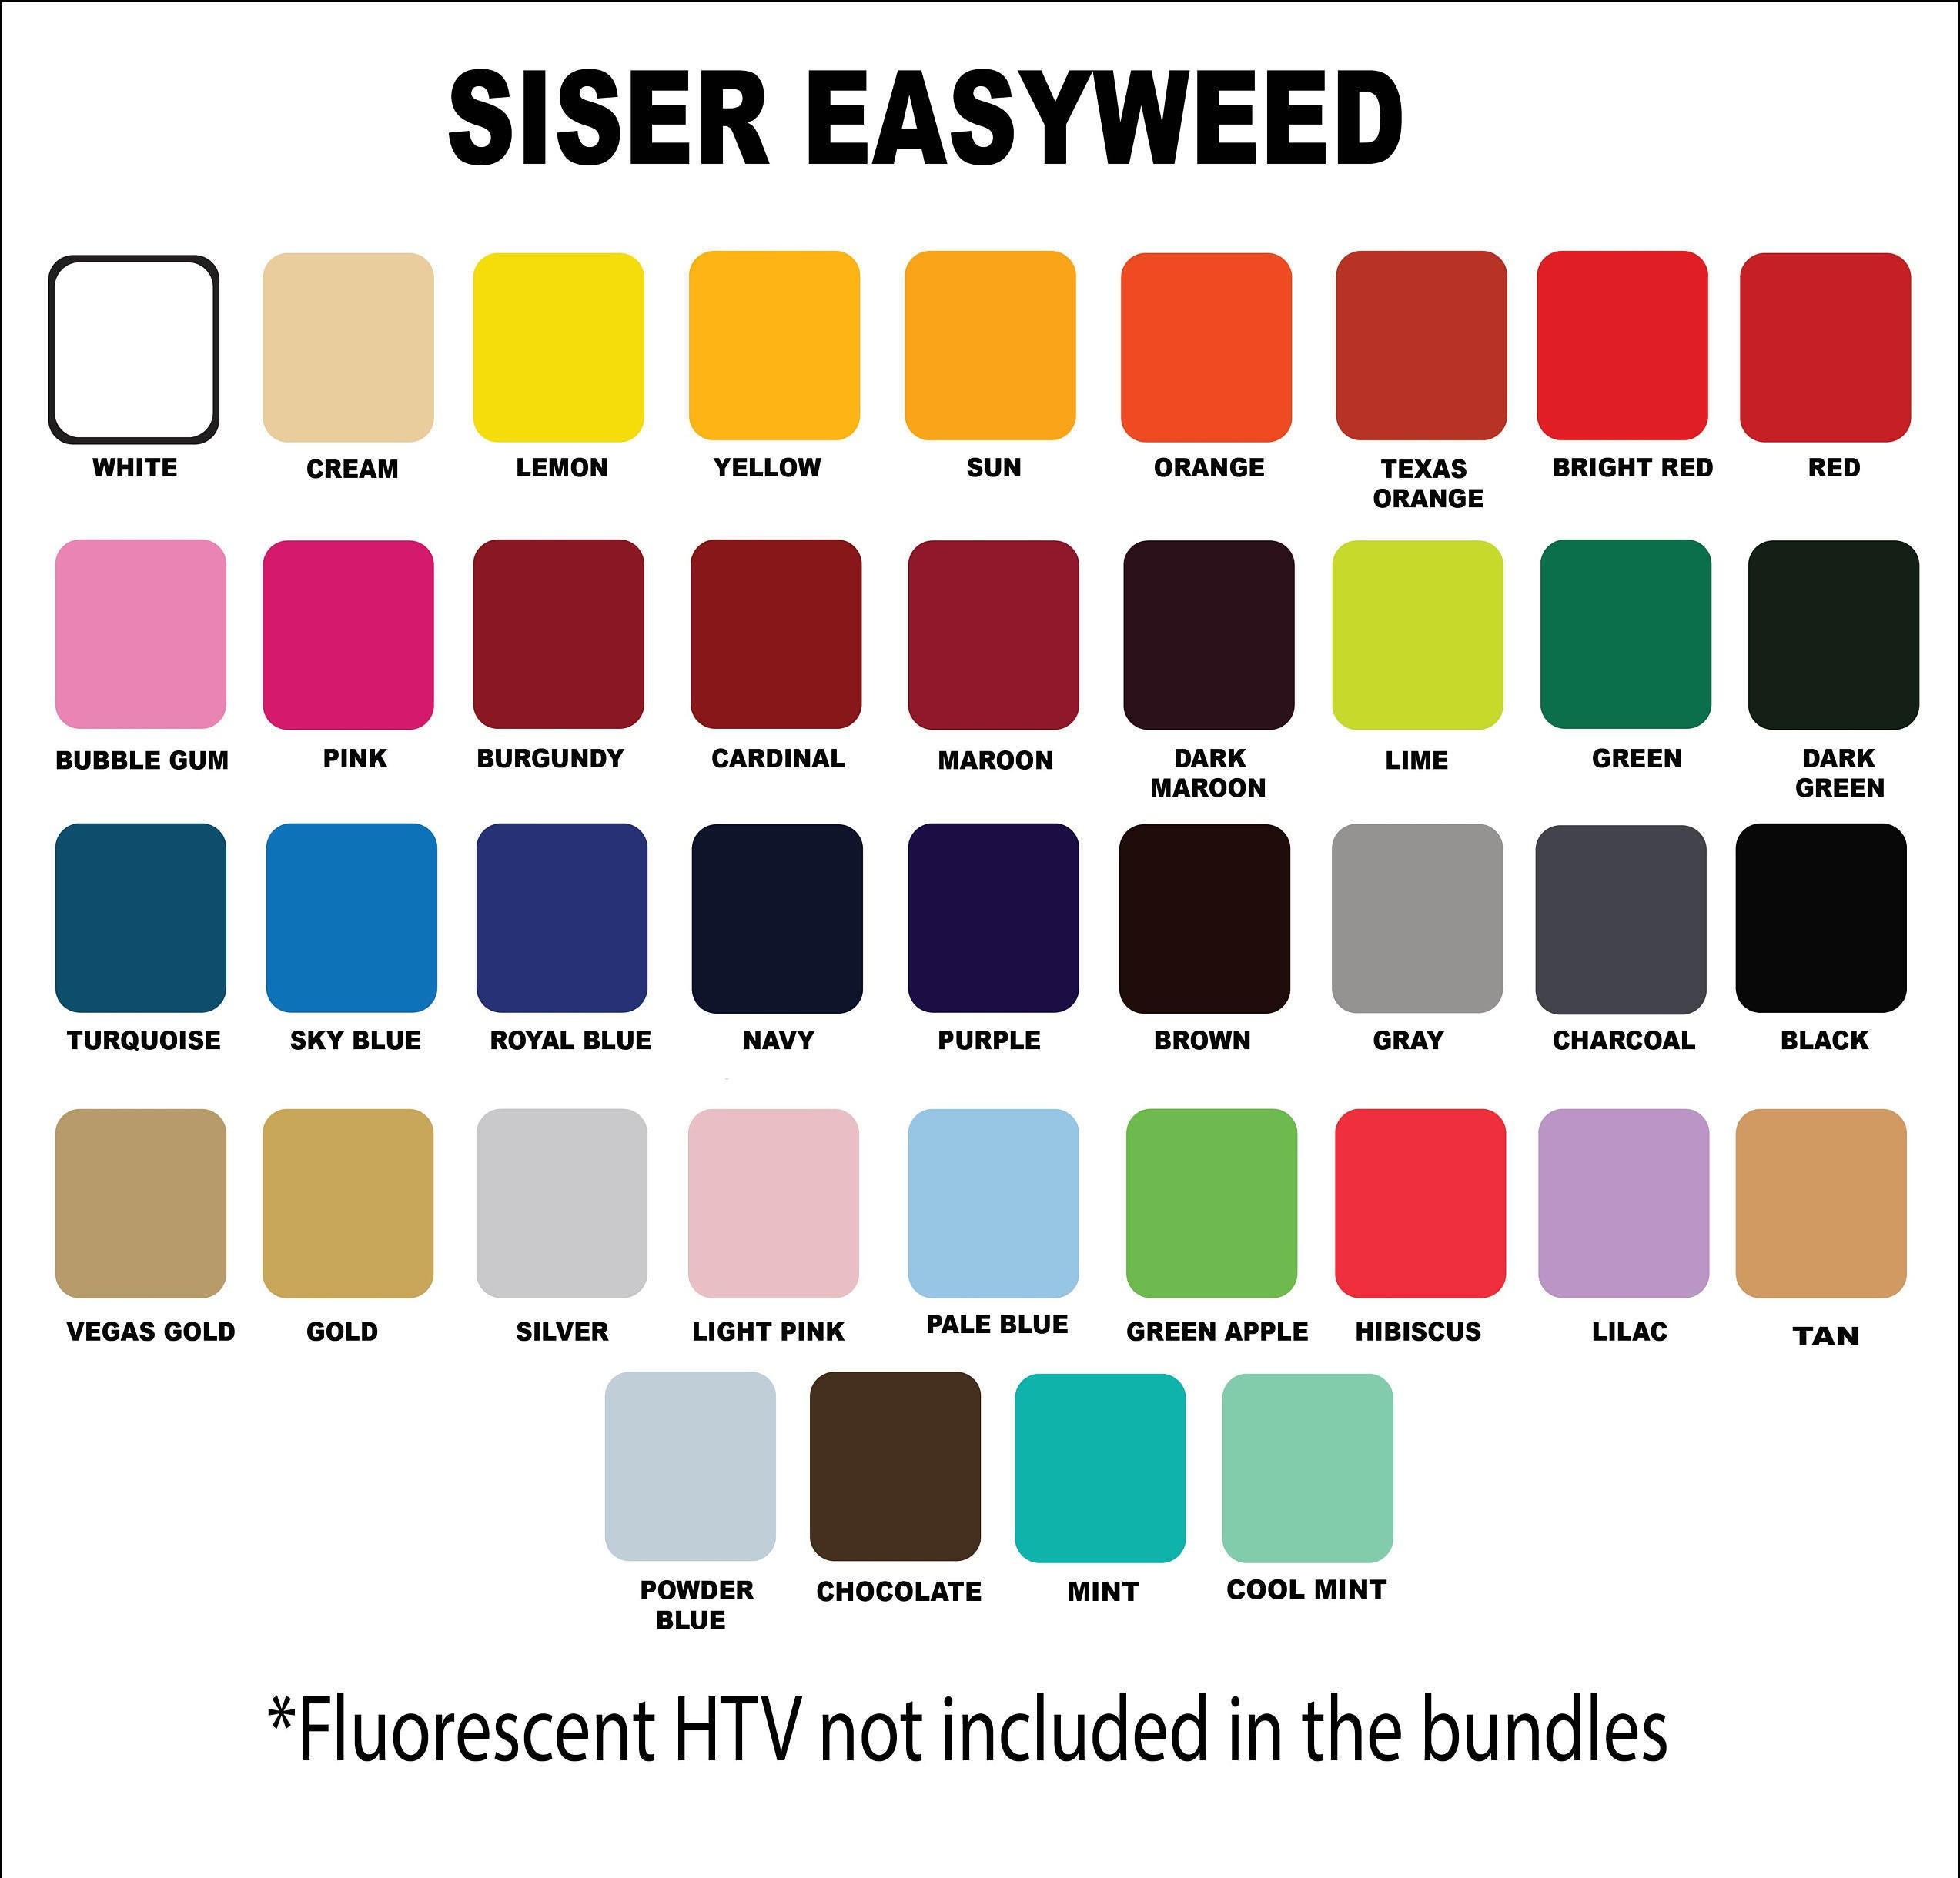 Siser Easyweed Heat Transfer Vinyl 12 X 15 10